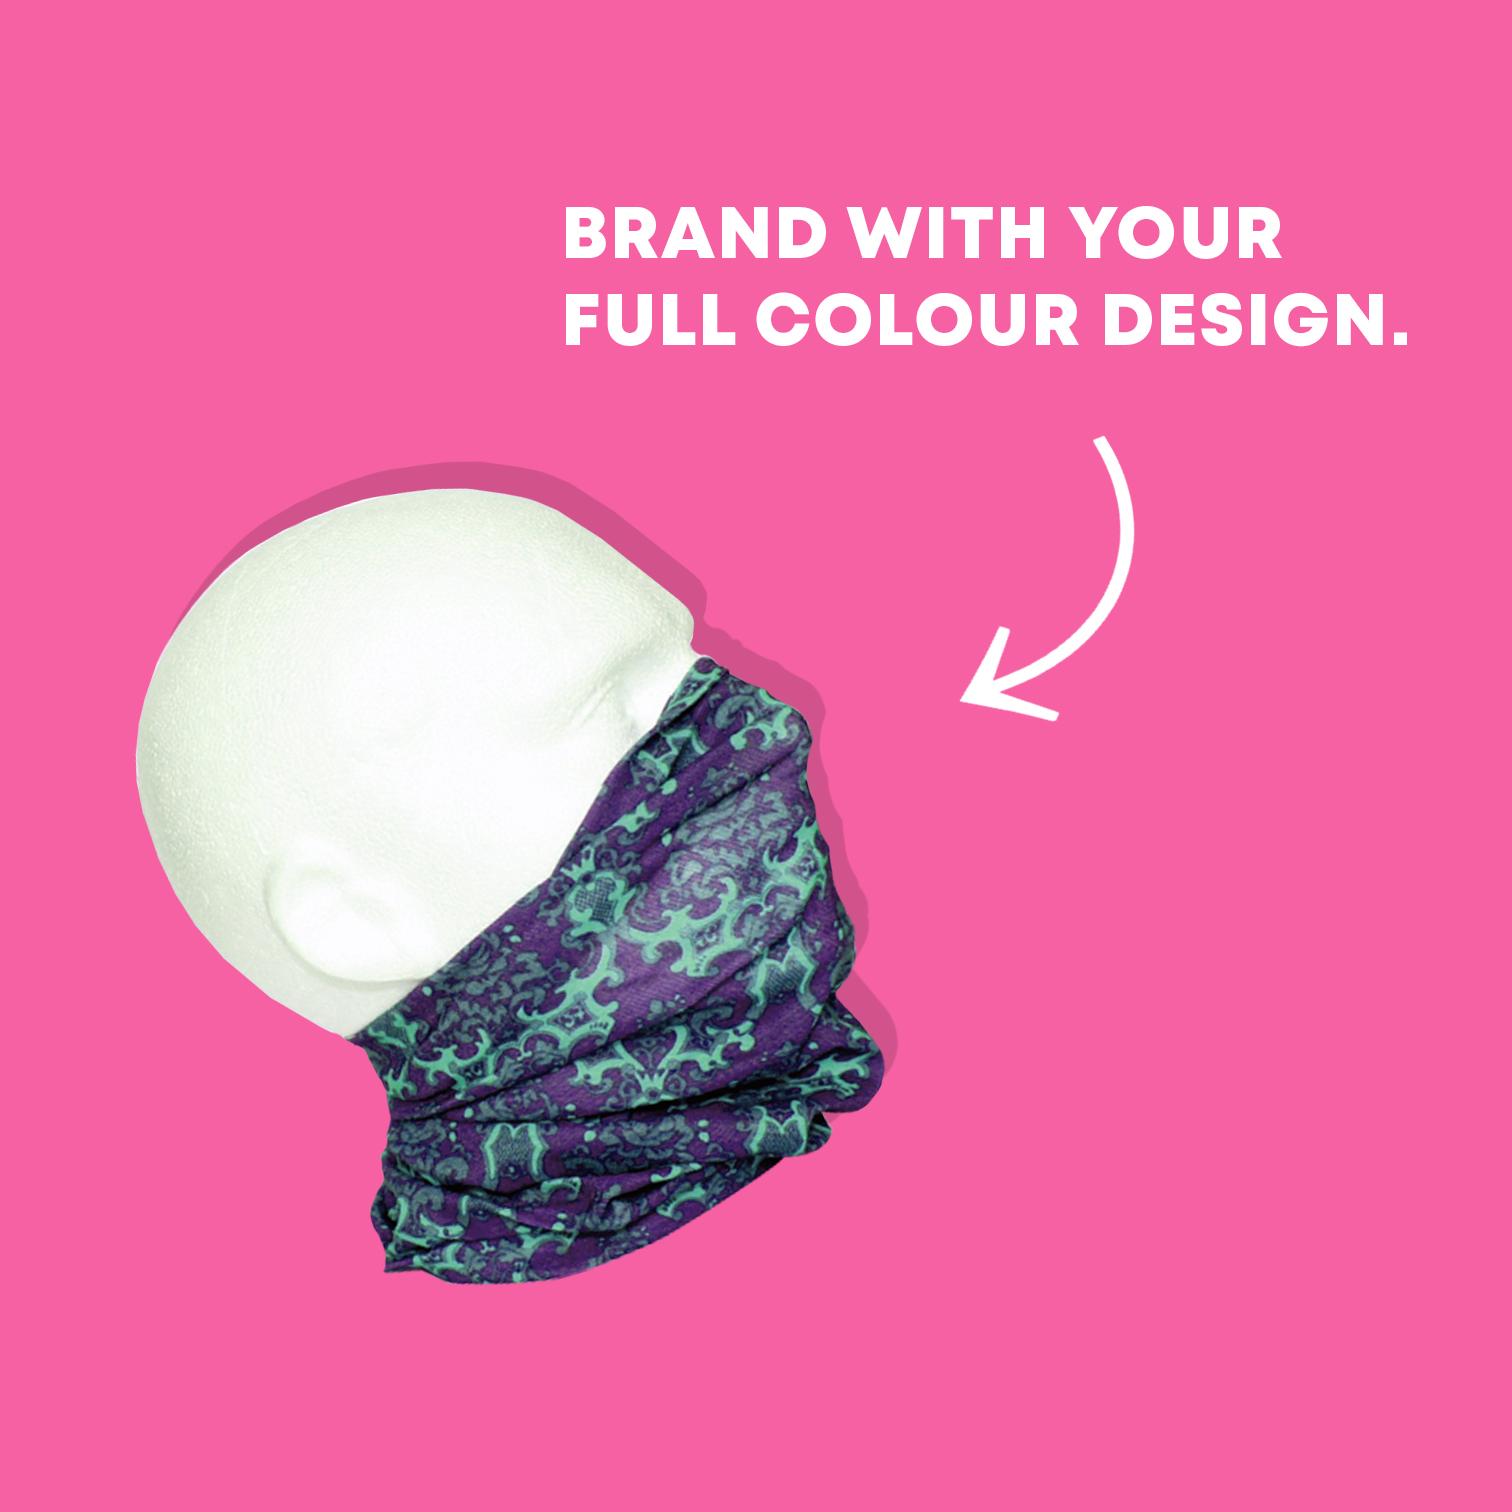 full colour face covering bandana